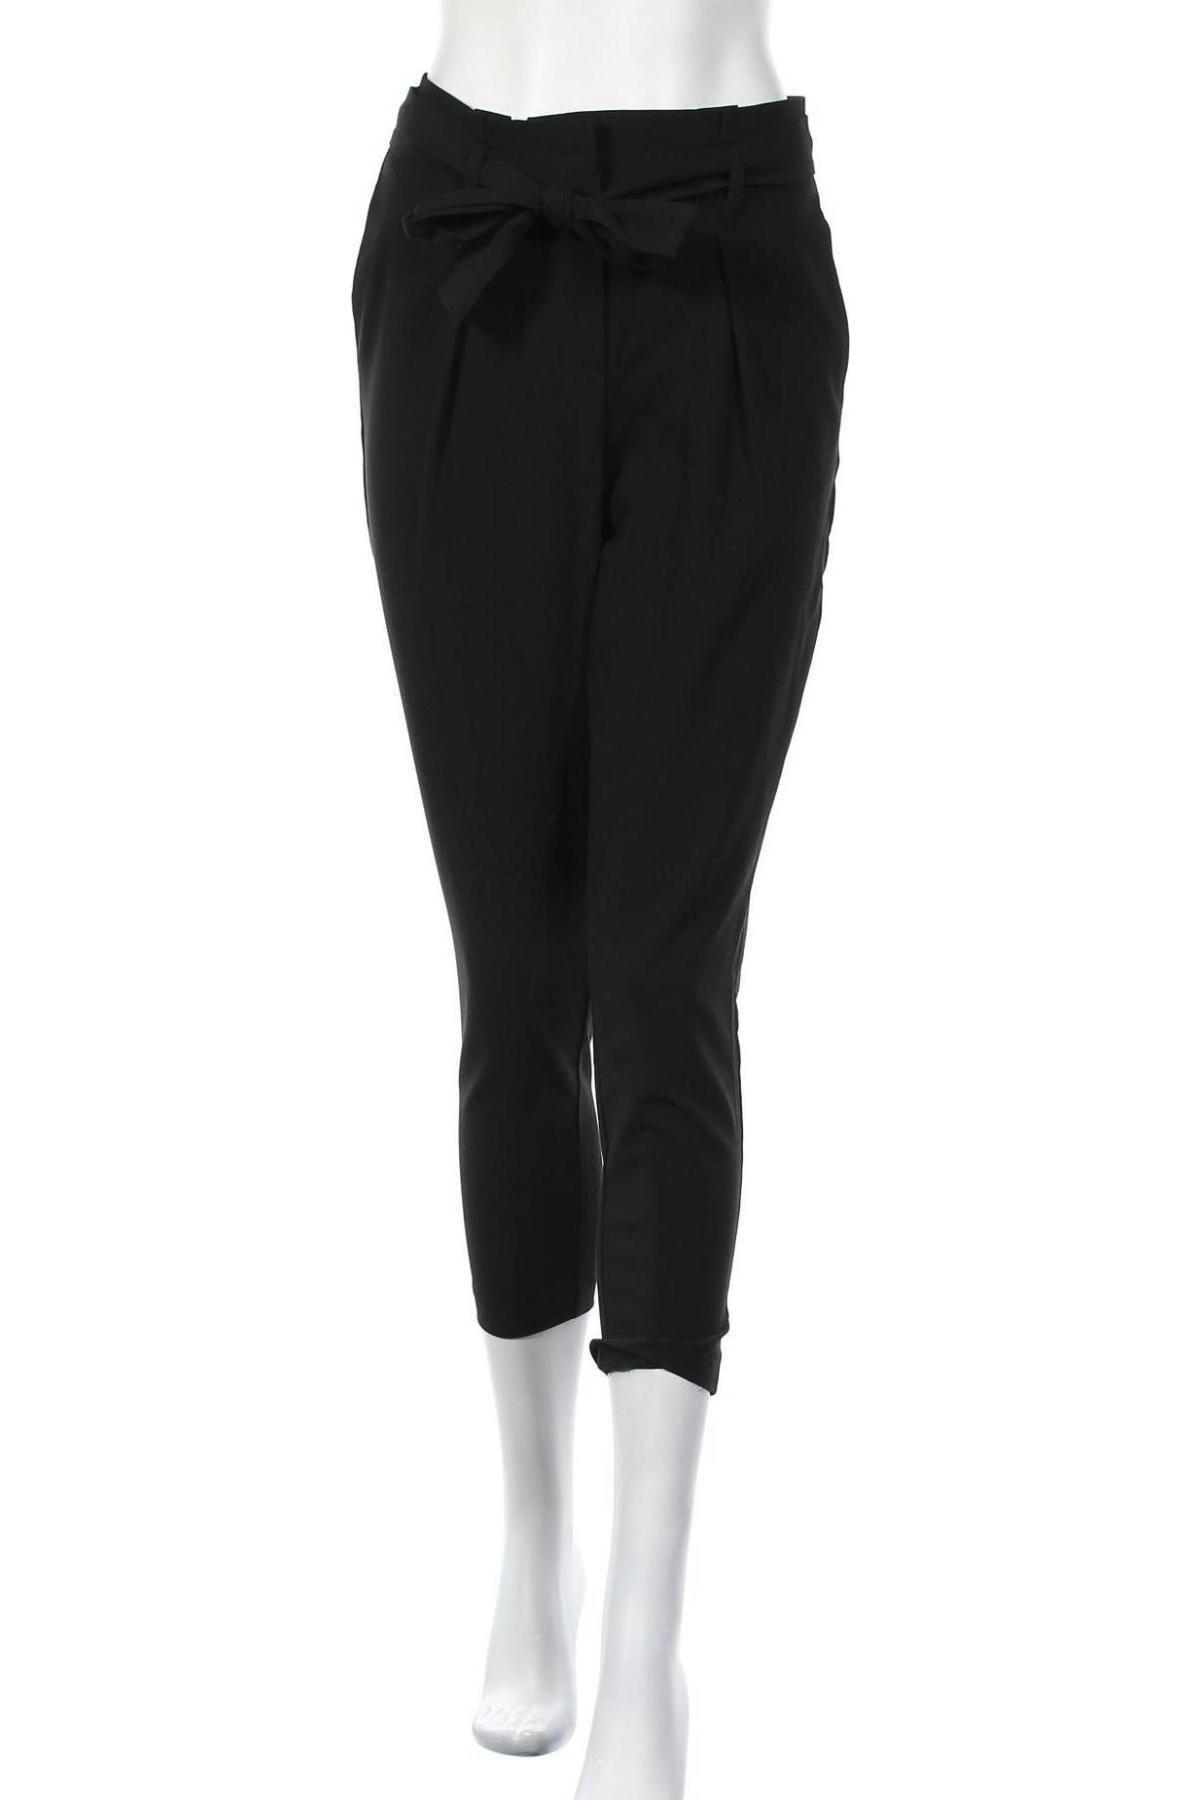 Дамски панталон ONLY, Размер S, Цвят Черен, 62% полиестер, 33% вискоза, 5% еластан, Цена 42,00лв.